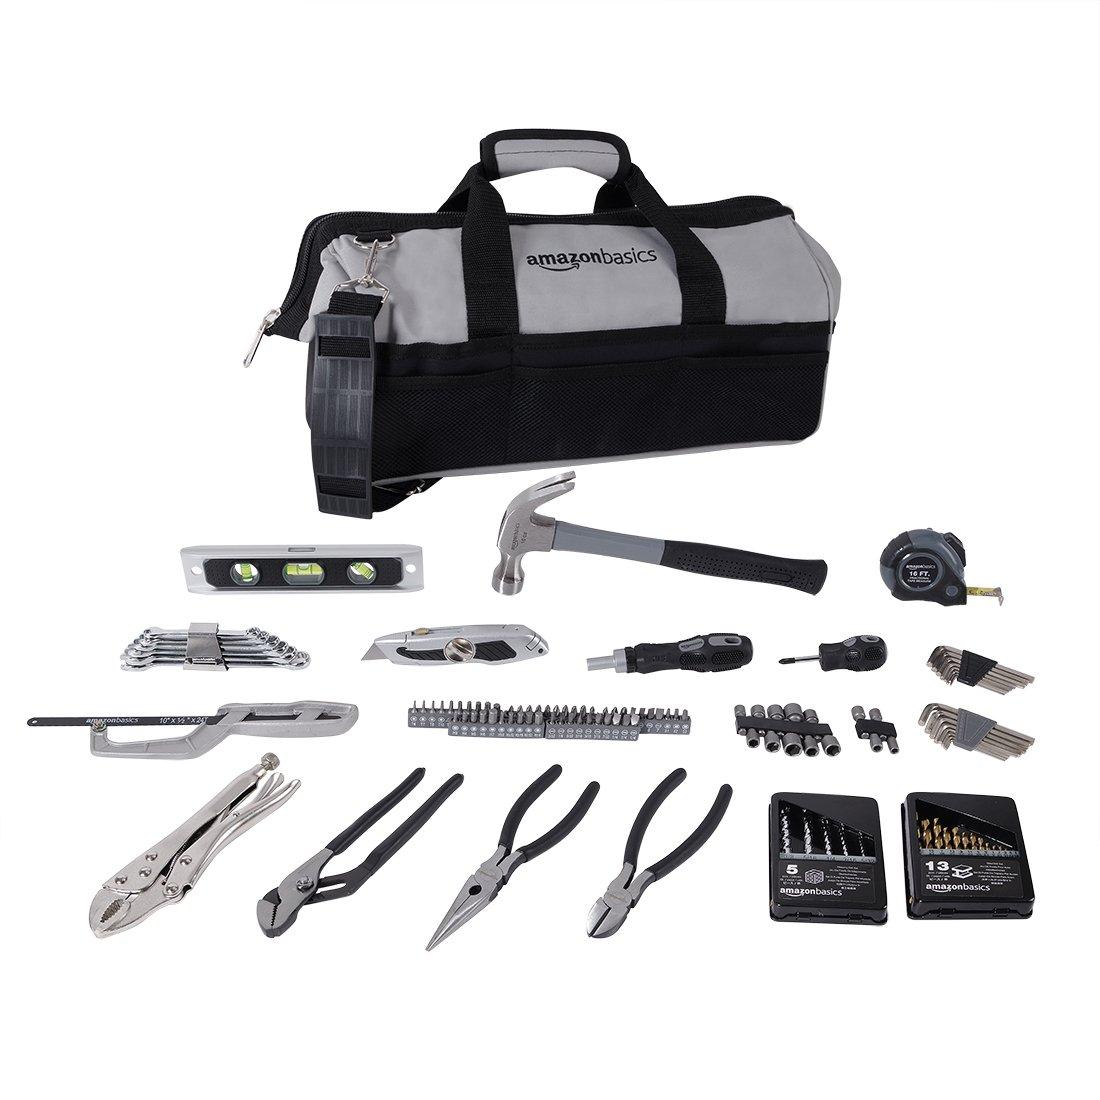 AmazonBasics 115-Piece Home Repair Kit by AmazonBasics (Image #1)